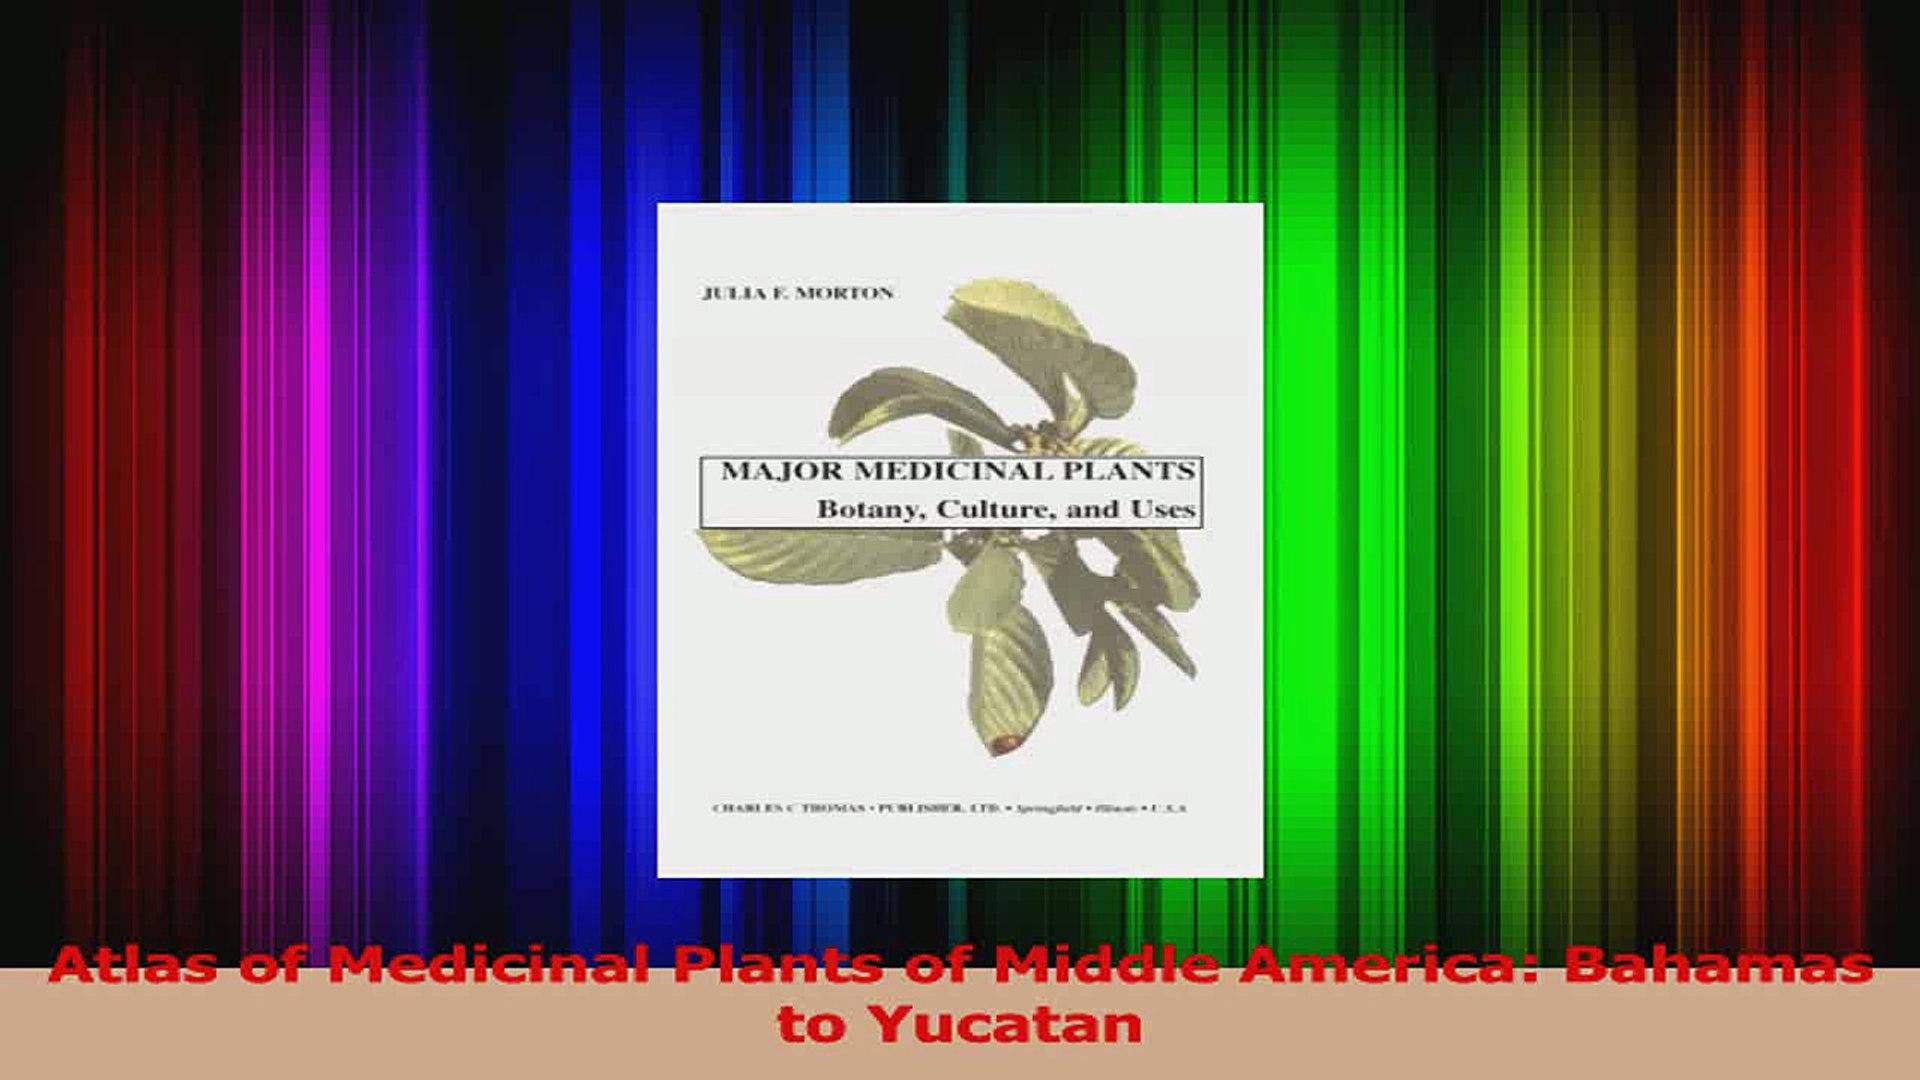 Atlas of Medicinal Plants of Middle America Bahamas to Yucatan